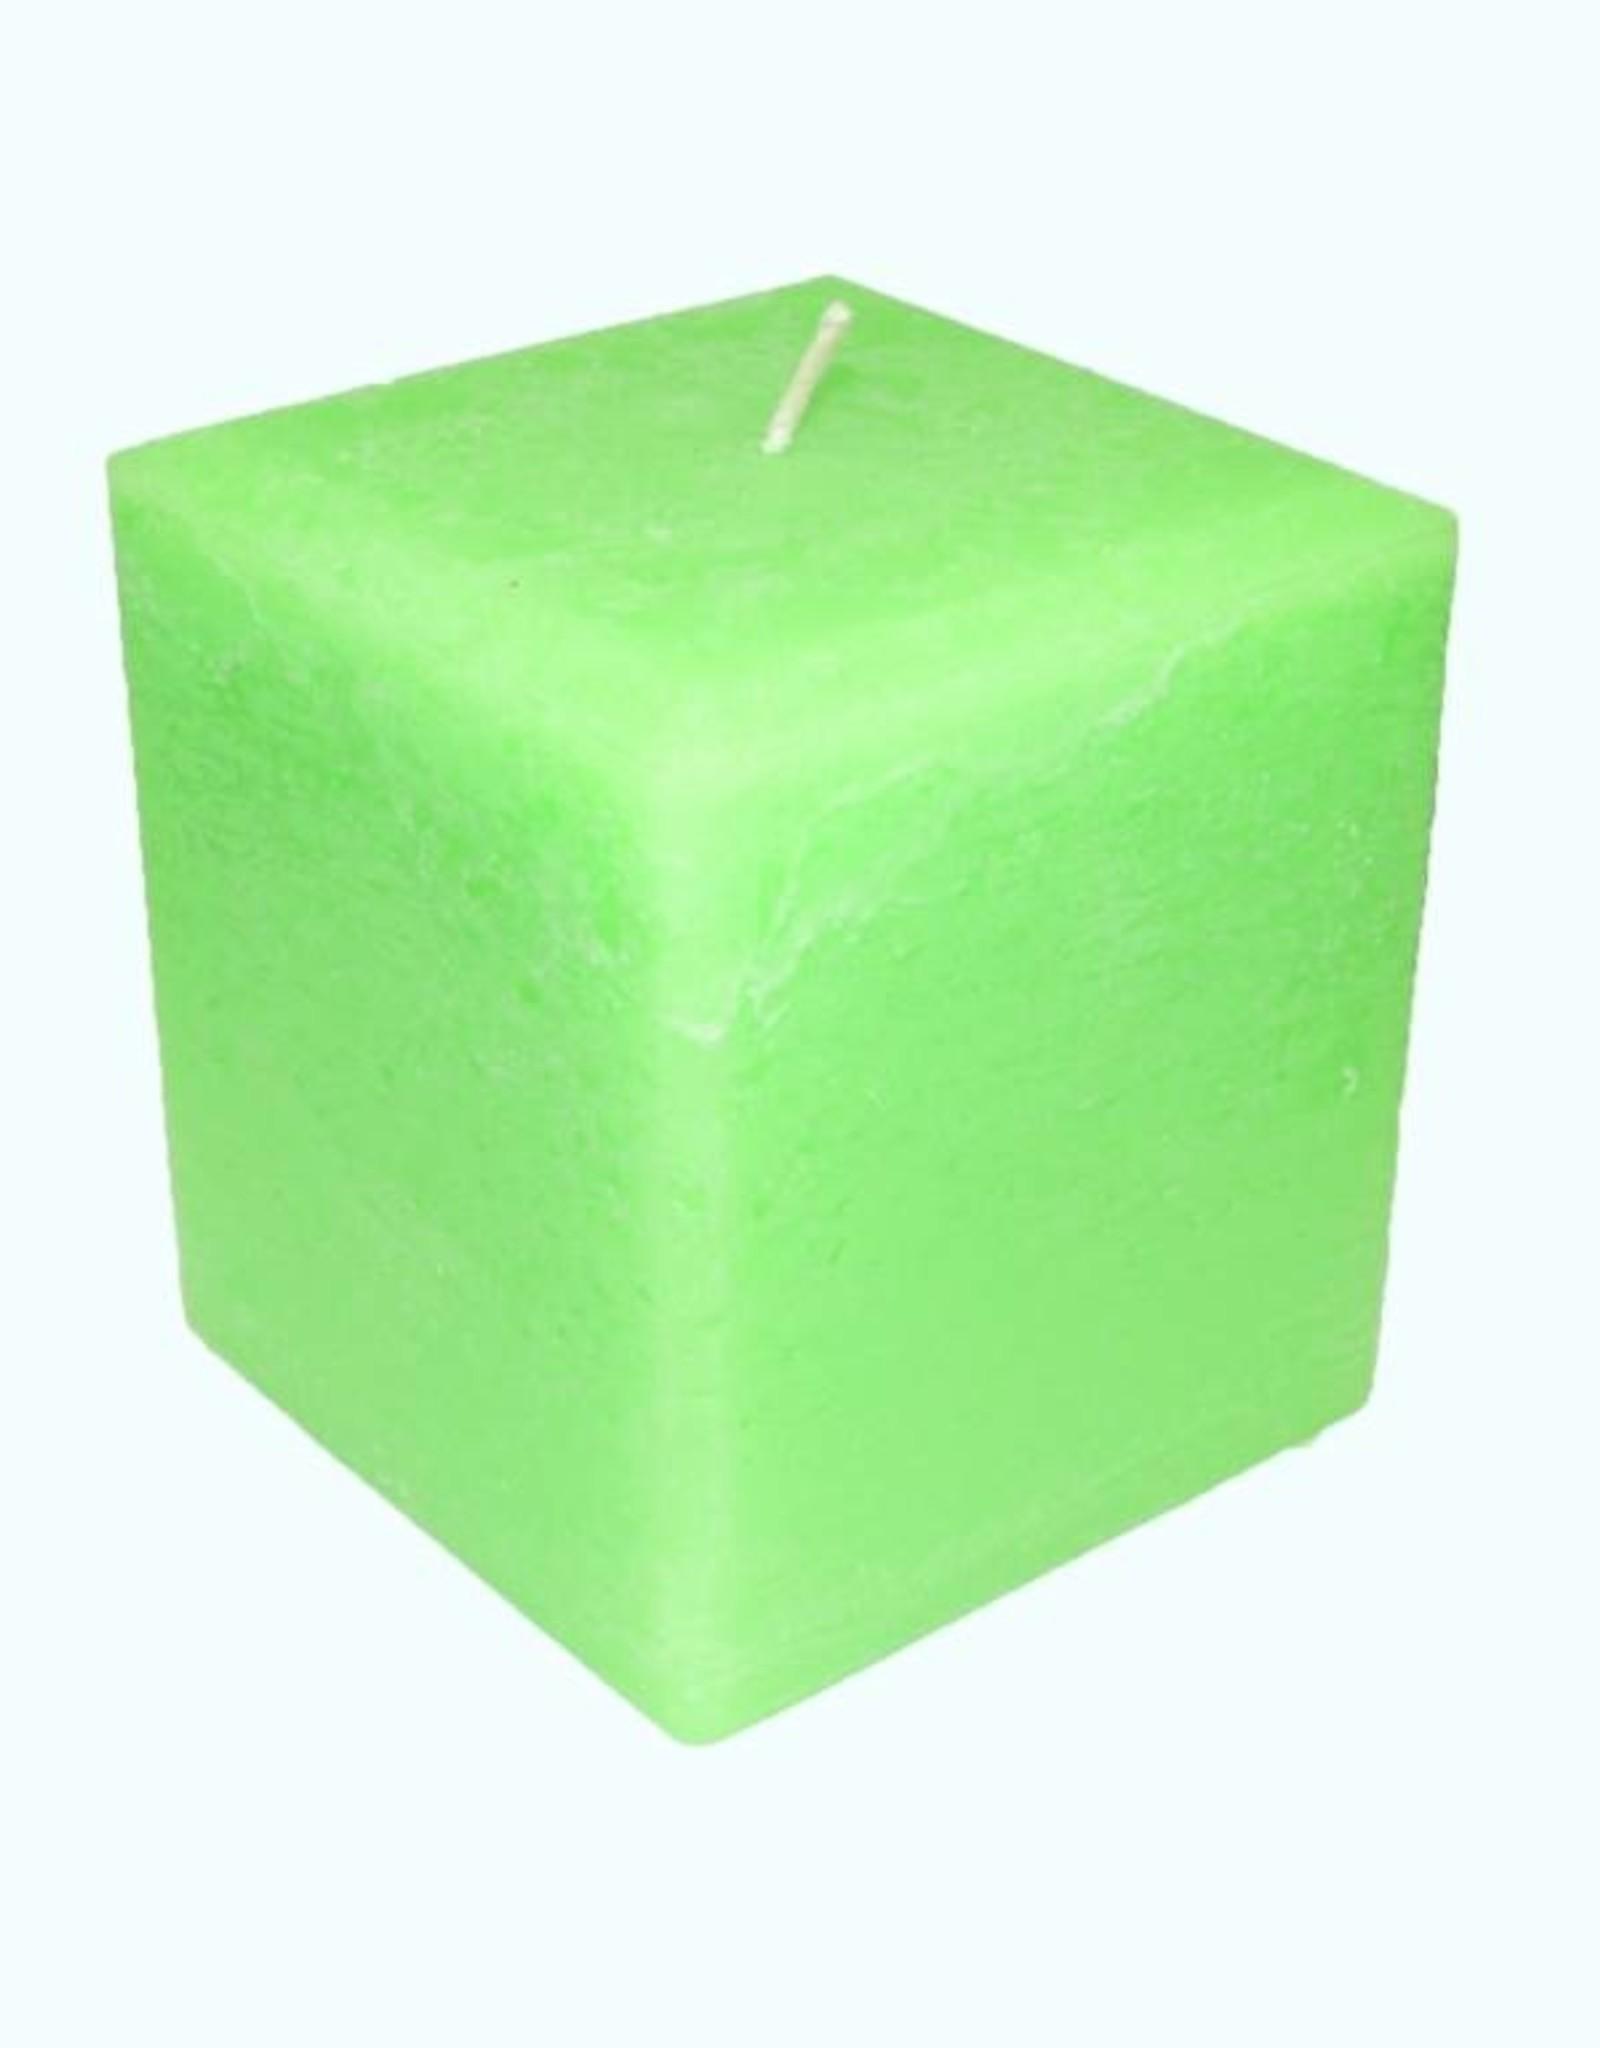 Grote vierkante kaars in de kleur Fluor Groen 10x10